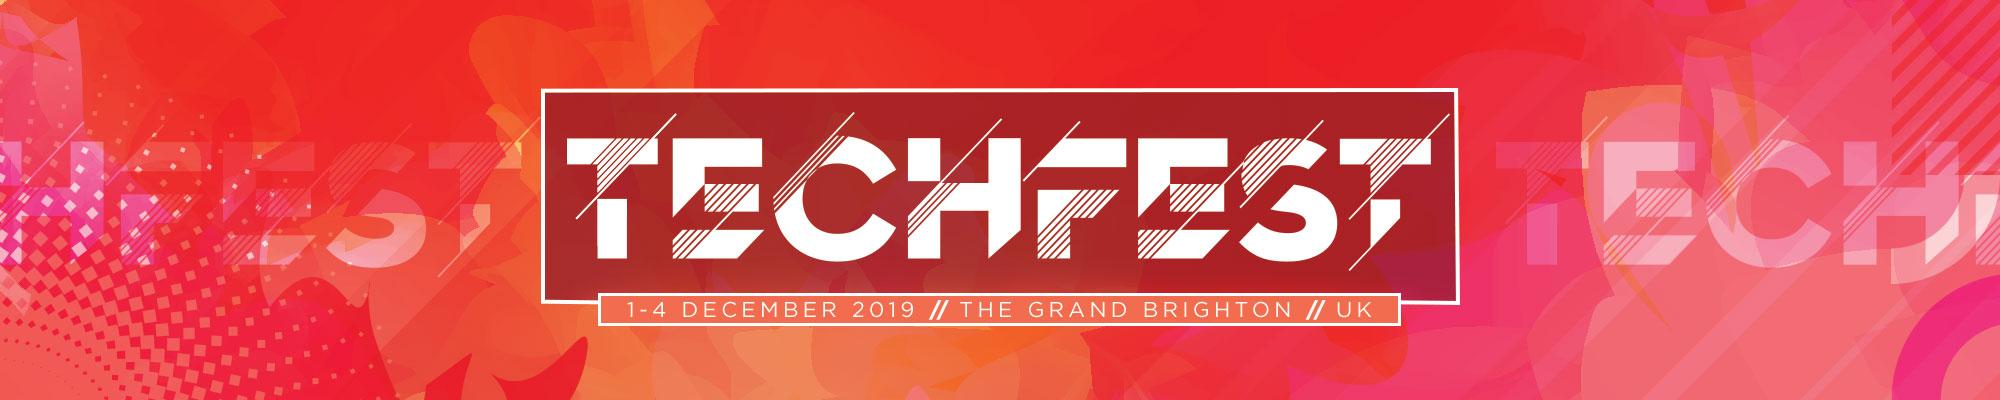 UKOUG Techfest 19, Brighton